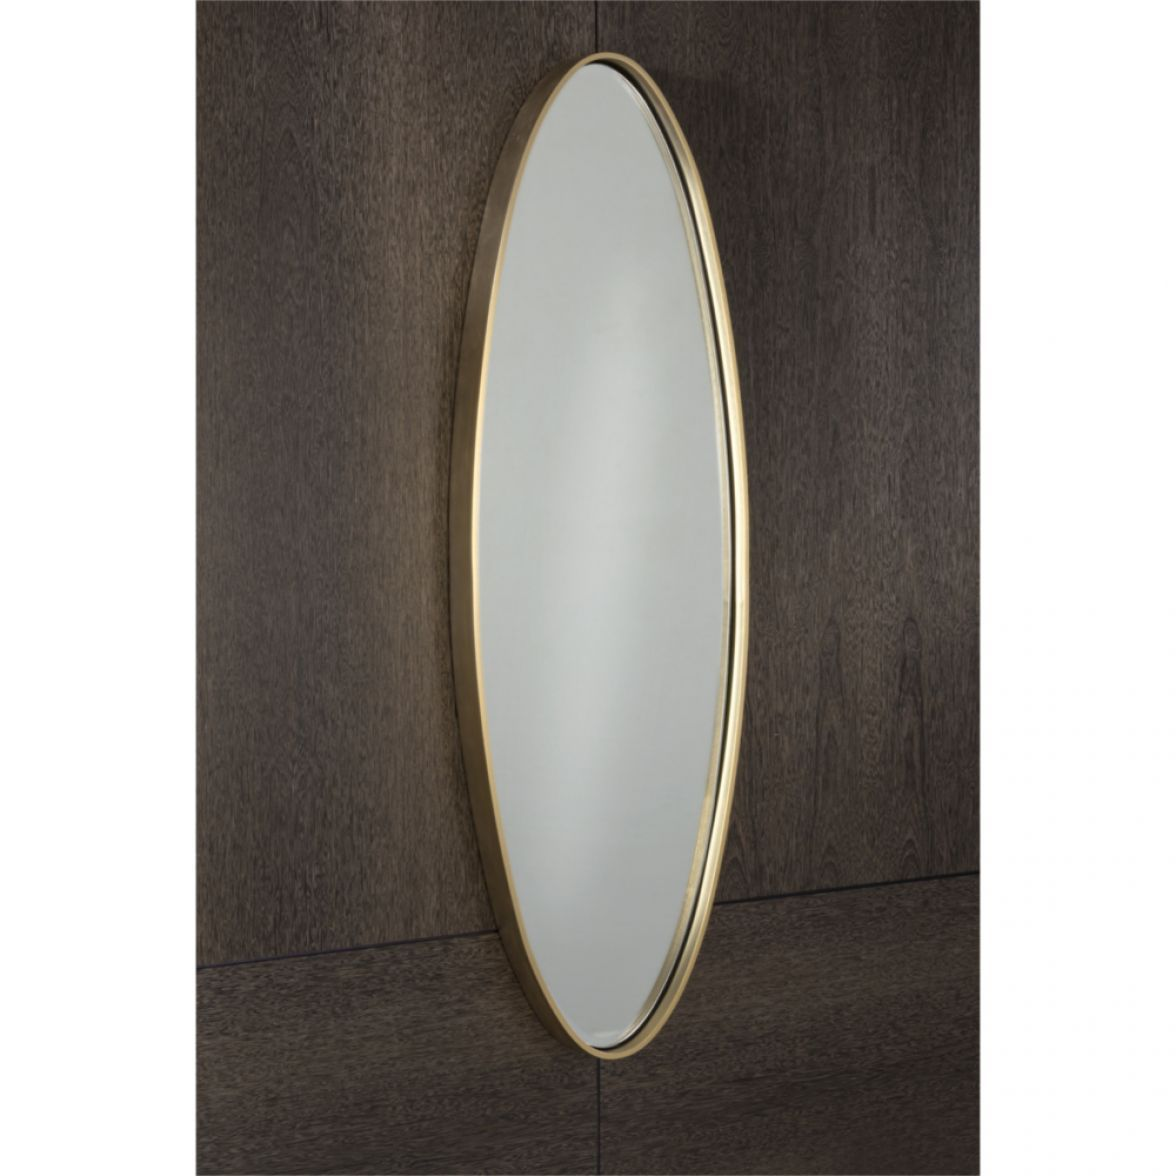 Зеркало Vanity фото цена